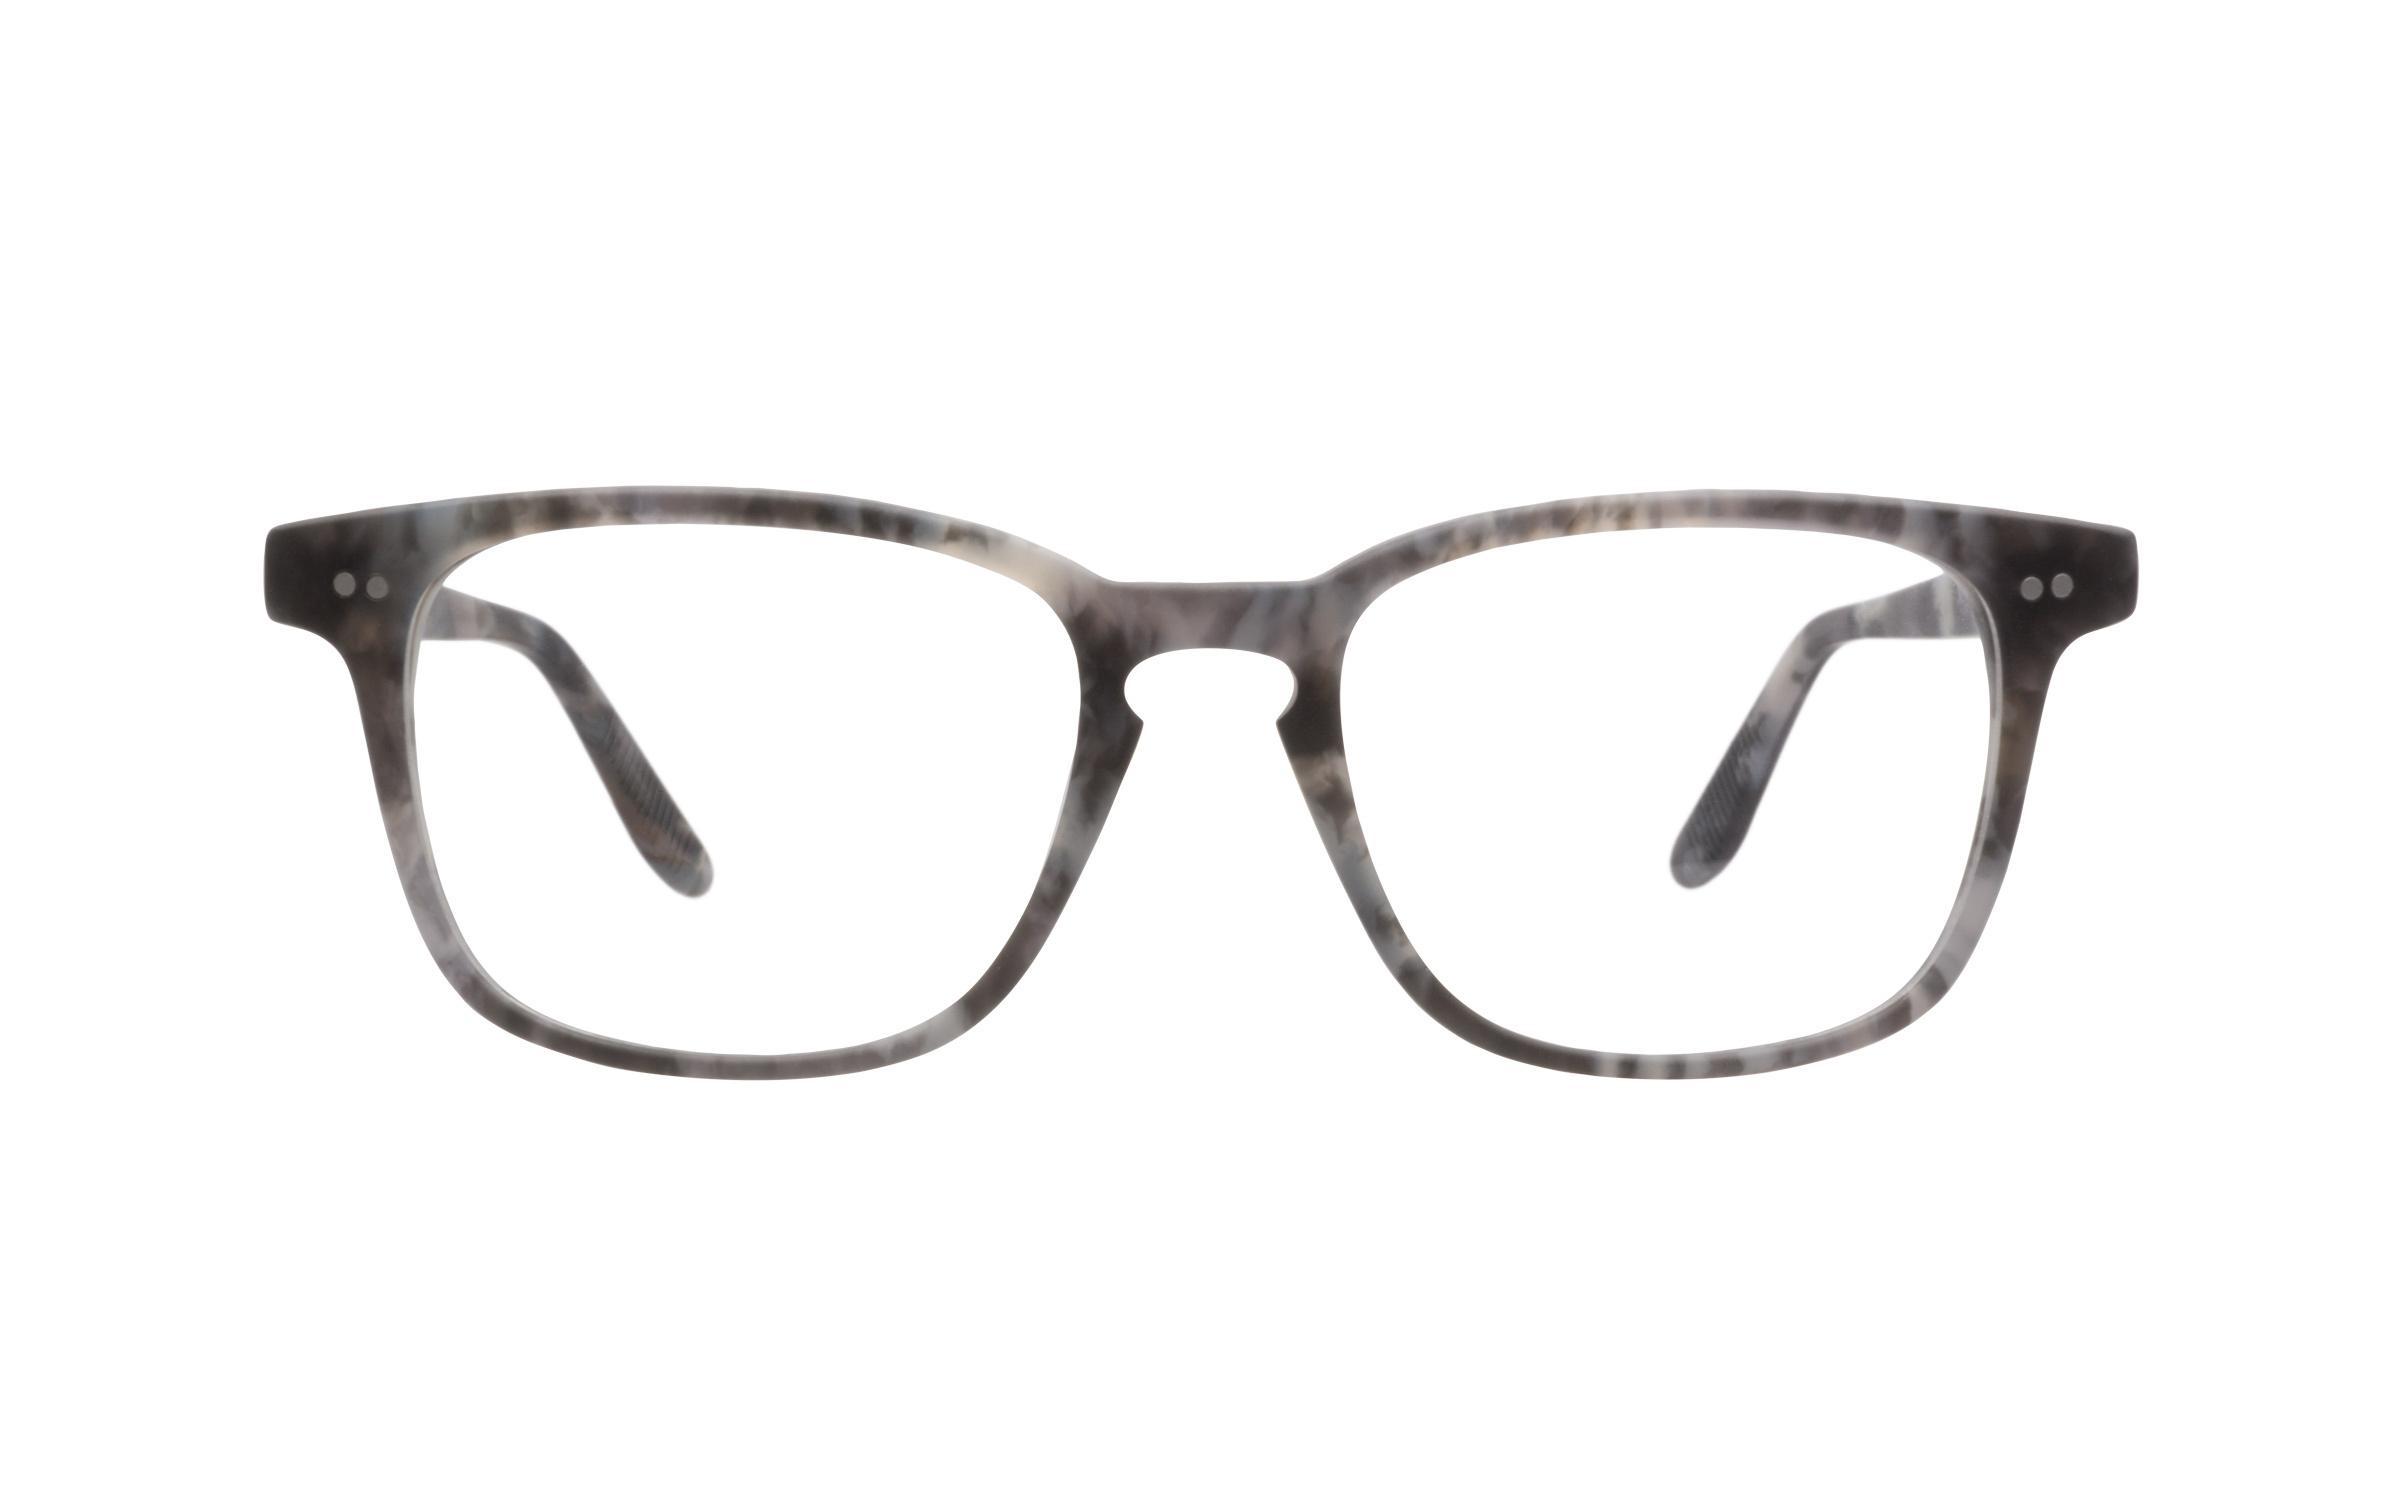 Joseph_Marc_Mens_Glasses_Vintage_Grey_Acetate_Online_Coastal